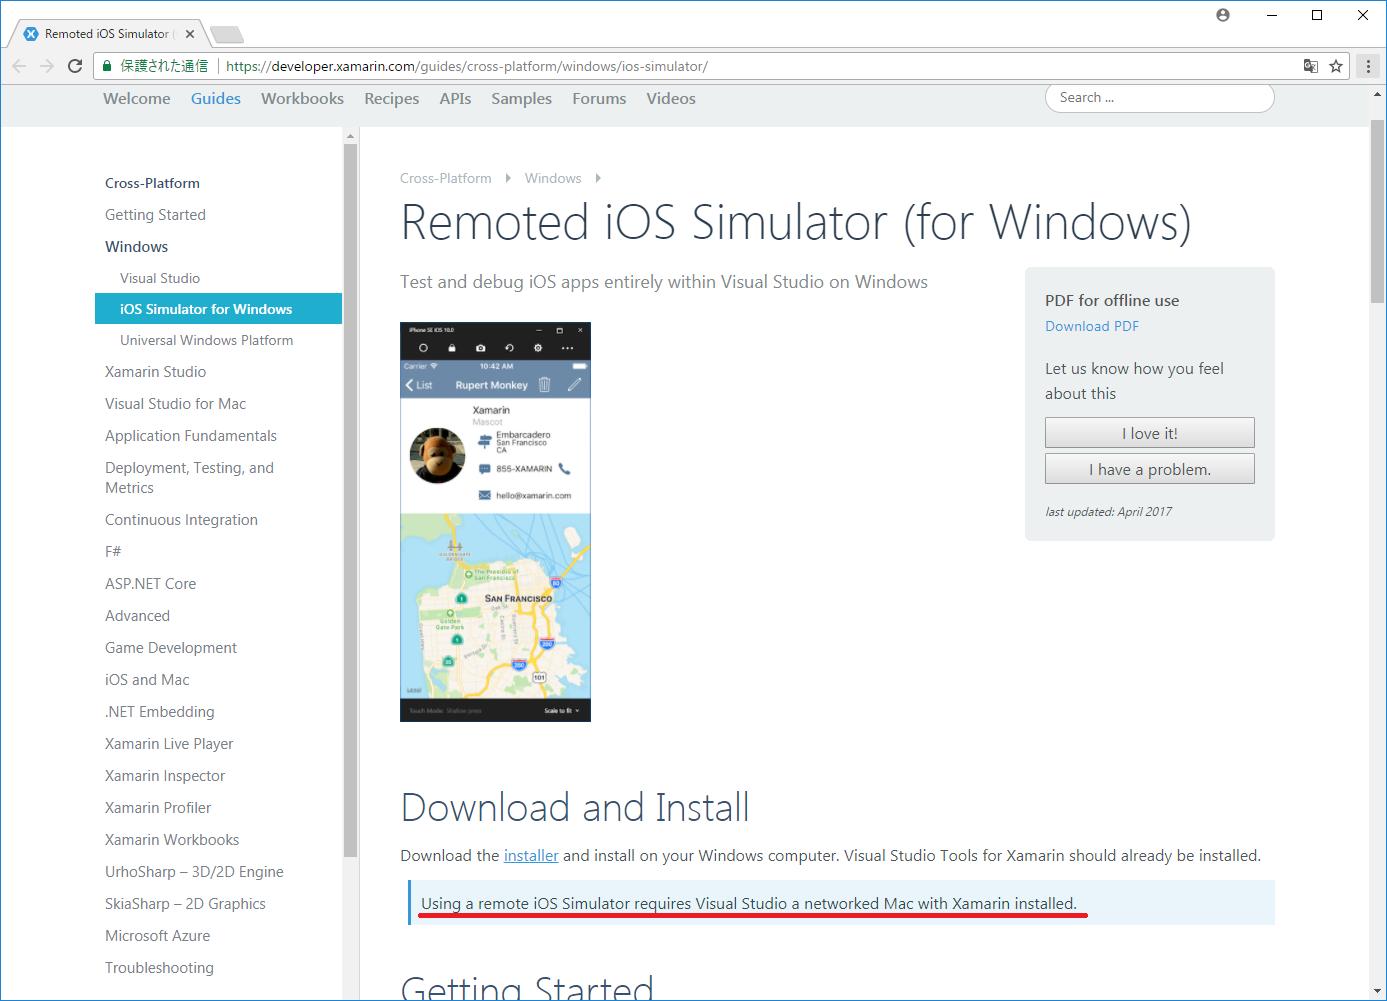 xamarin_ios_simulator_03.png